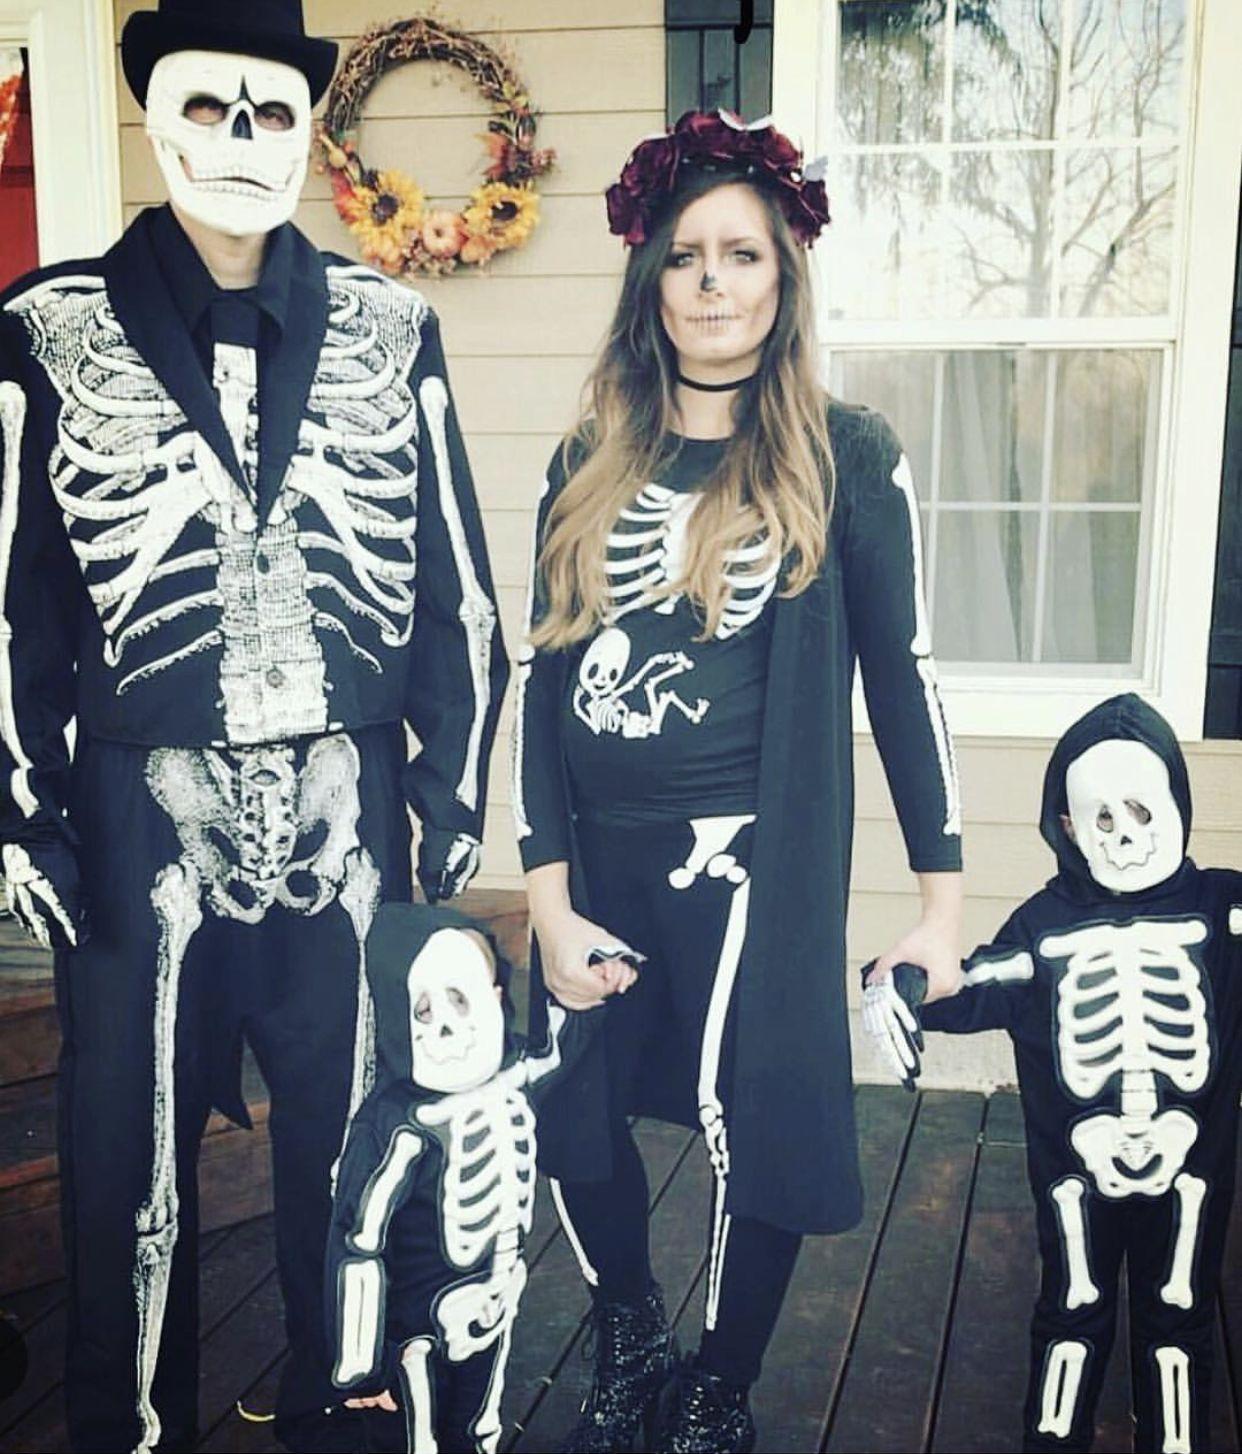 Halloween Costumes 2020 Skeleton Family Halloween Costumes   Pregnant halloween costumes family